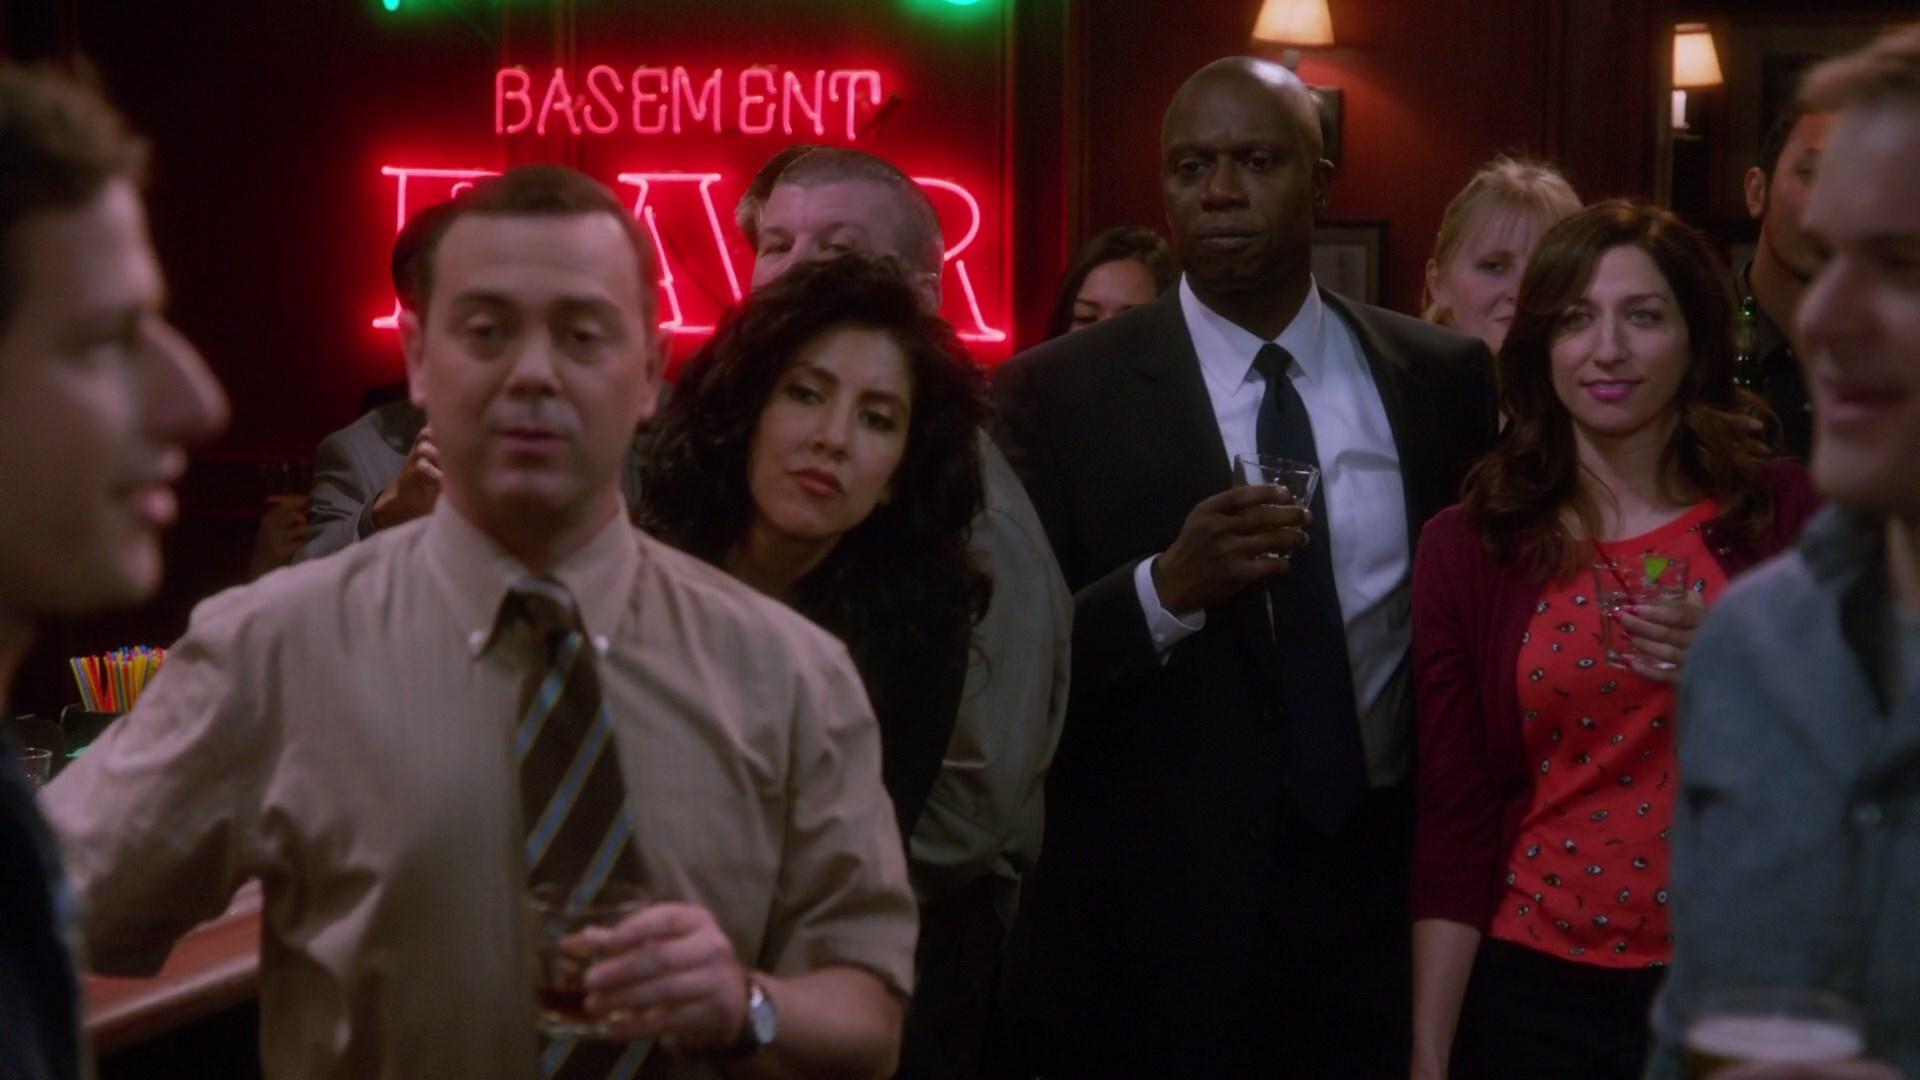 Brooklyn Nine-Nine Season 1 (2013) x264 8 Bits 1080p